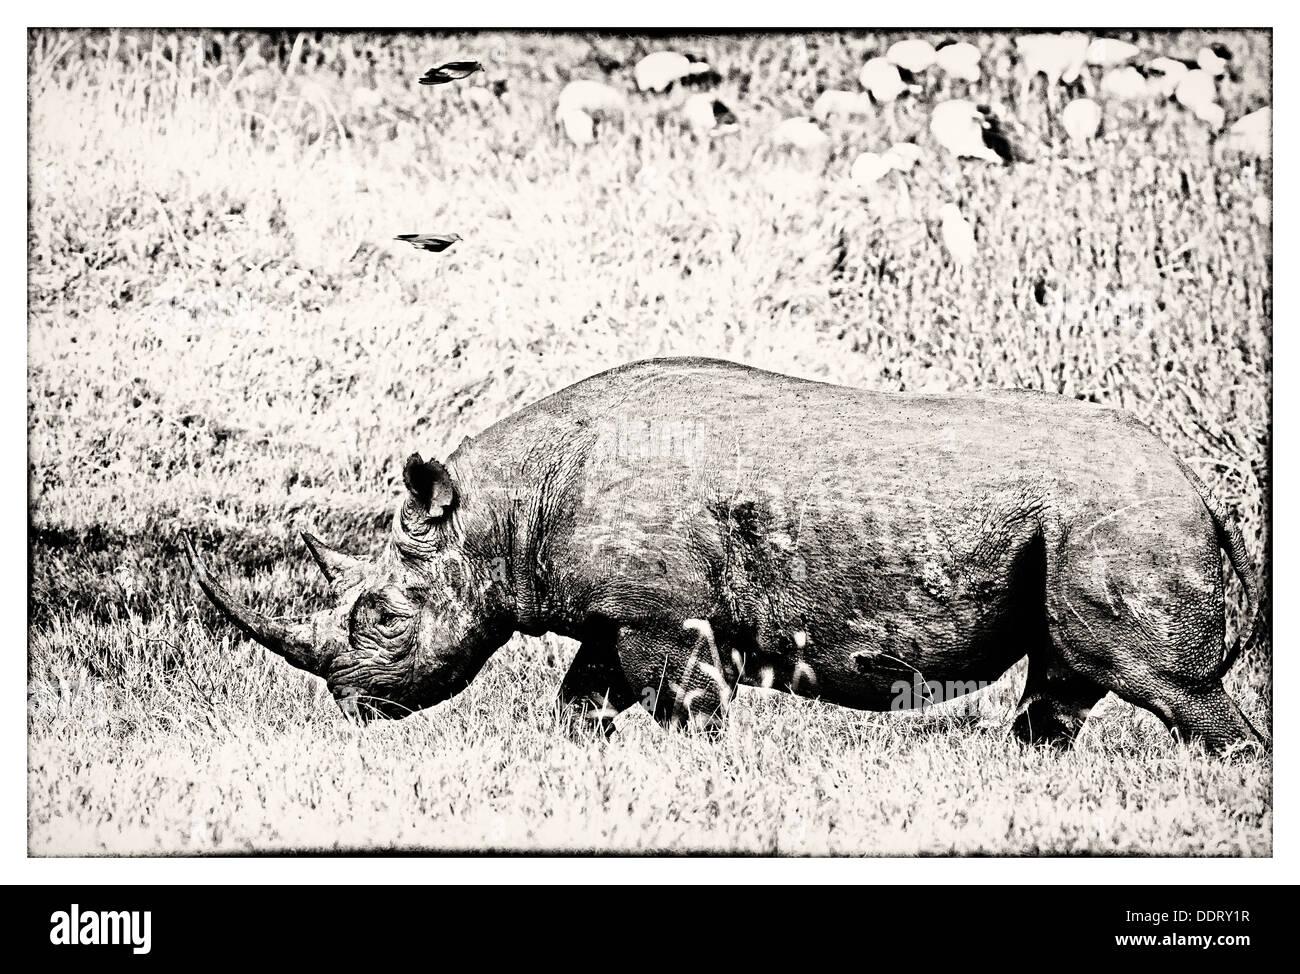 Single black rhino walking past pond, side view close up in stylised monochrome, Lake Nakuru, Kenya - Stock Image